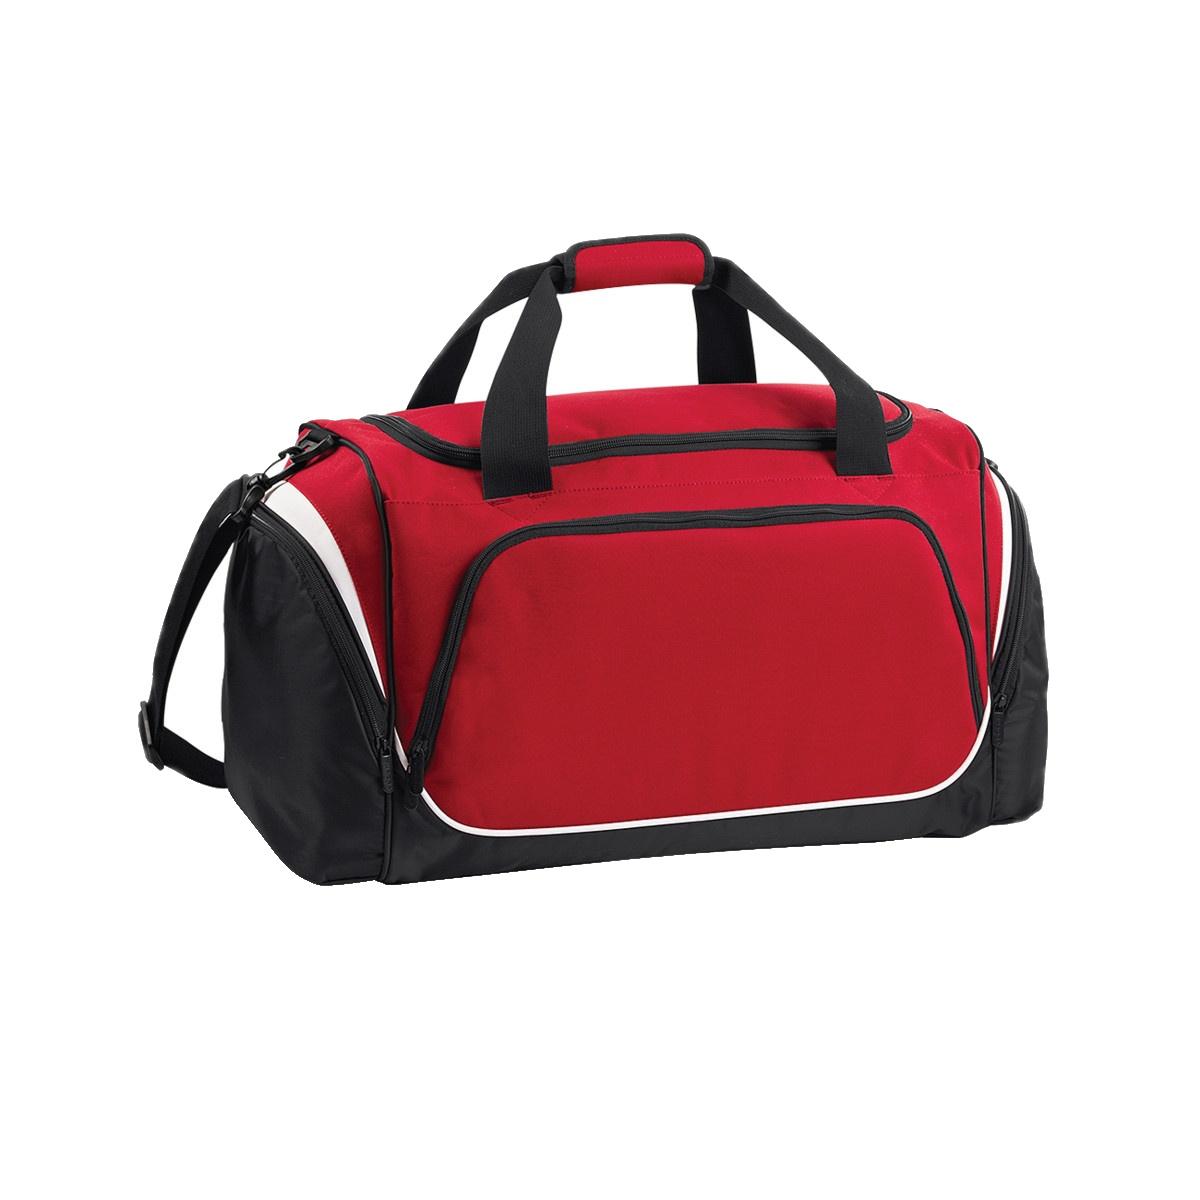 Quadra Pro Team Holdall / Duffle Bag (55 Litres) (One Size) (Classic Red/Black/White)